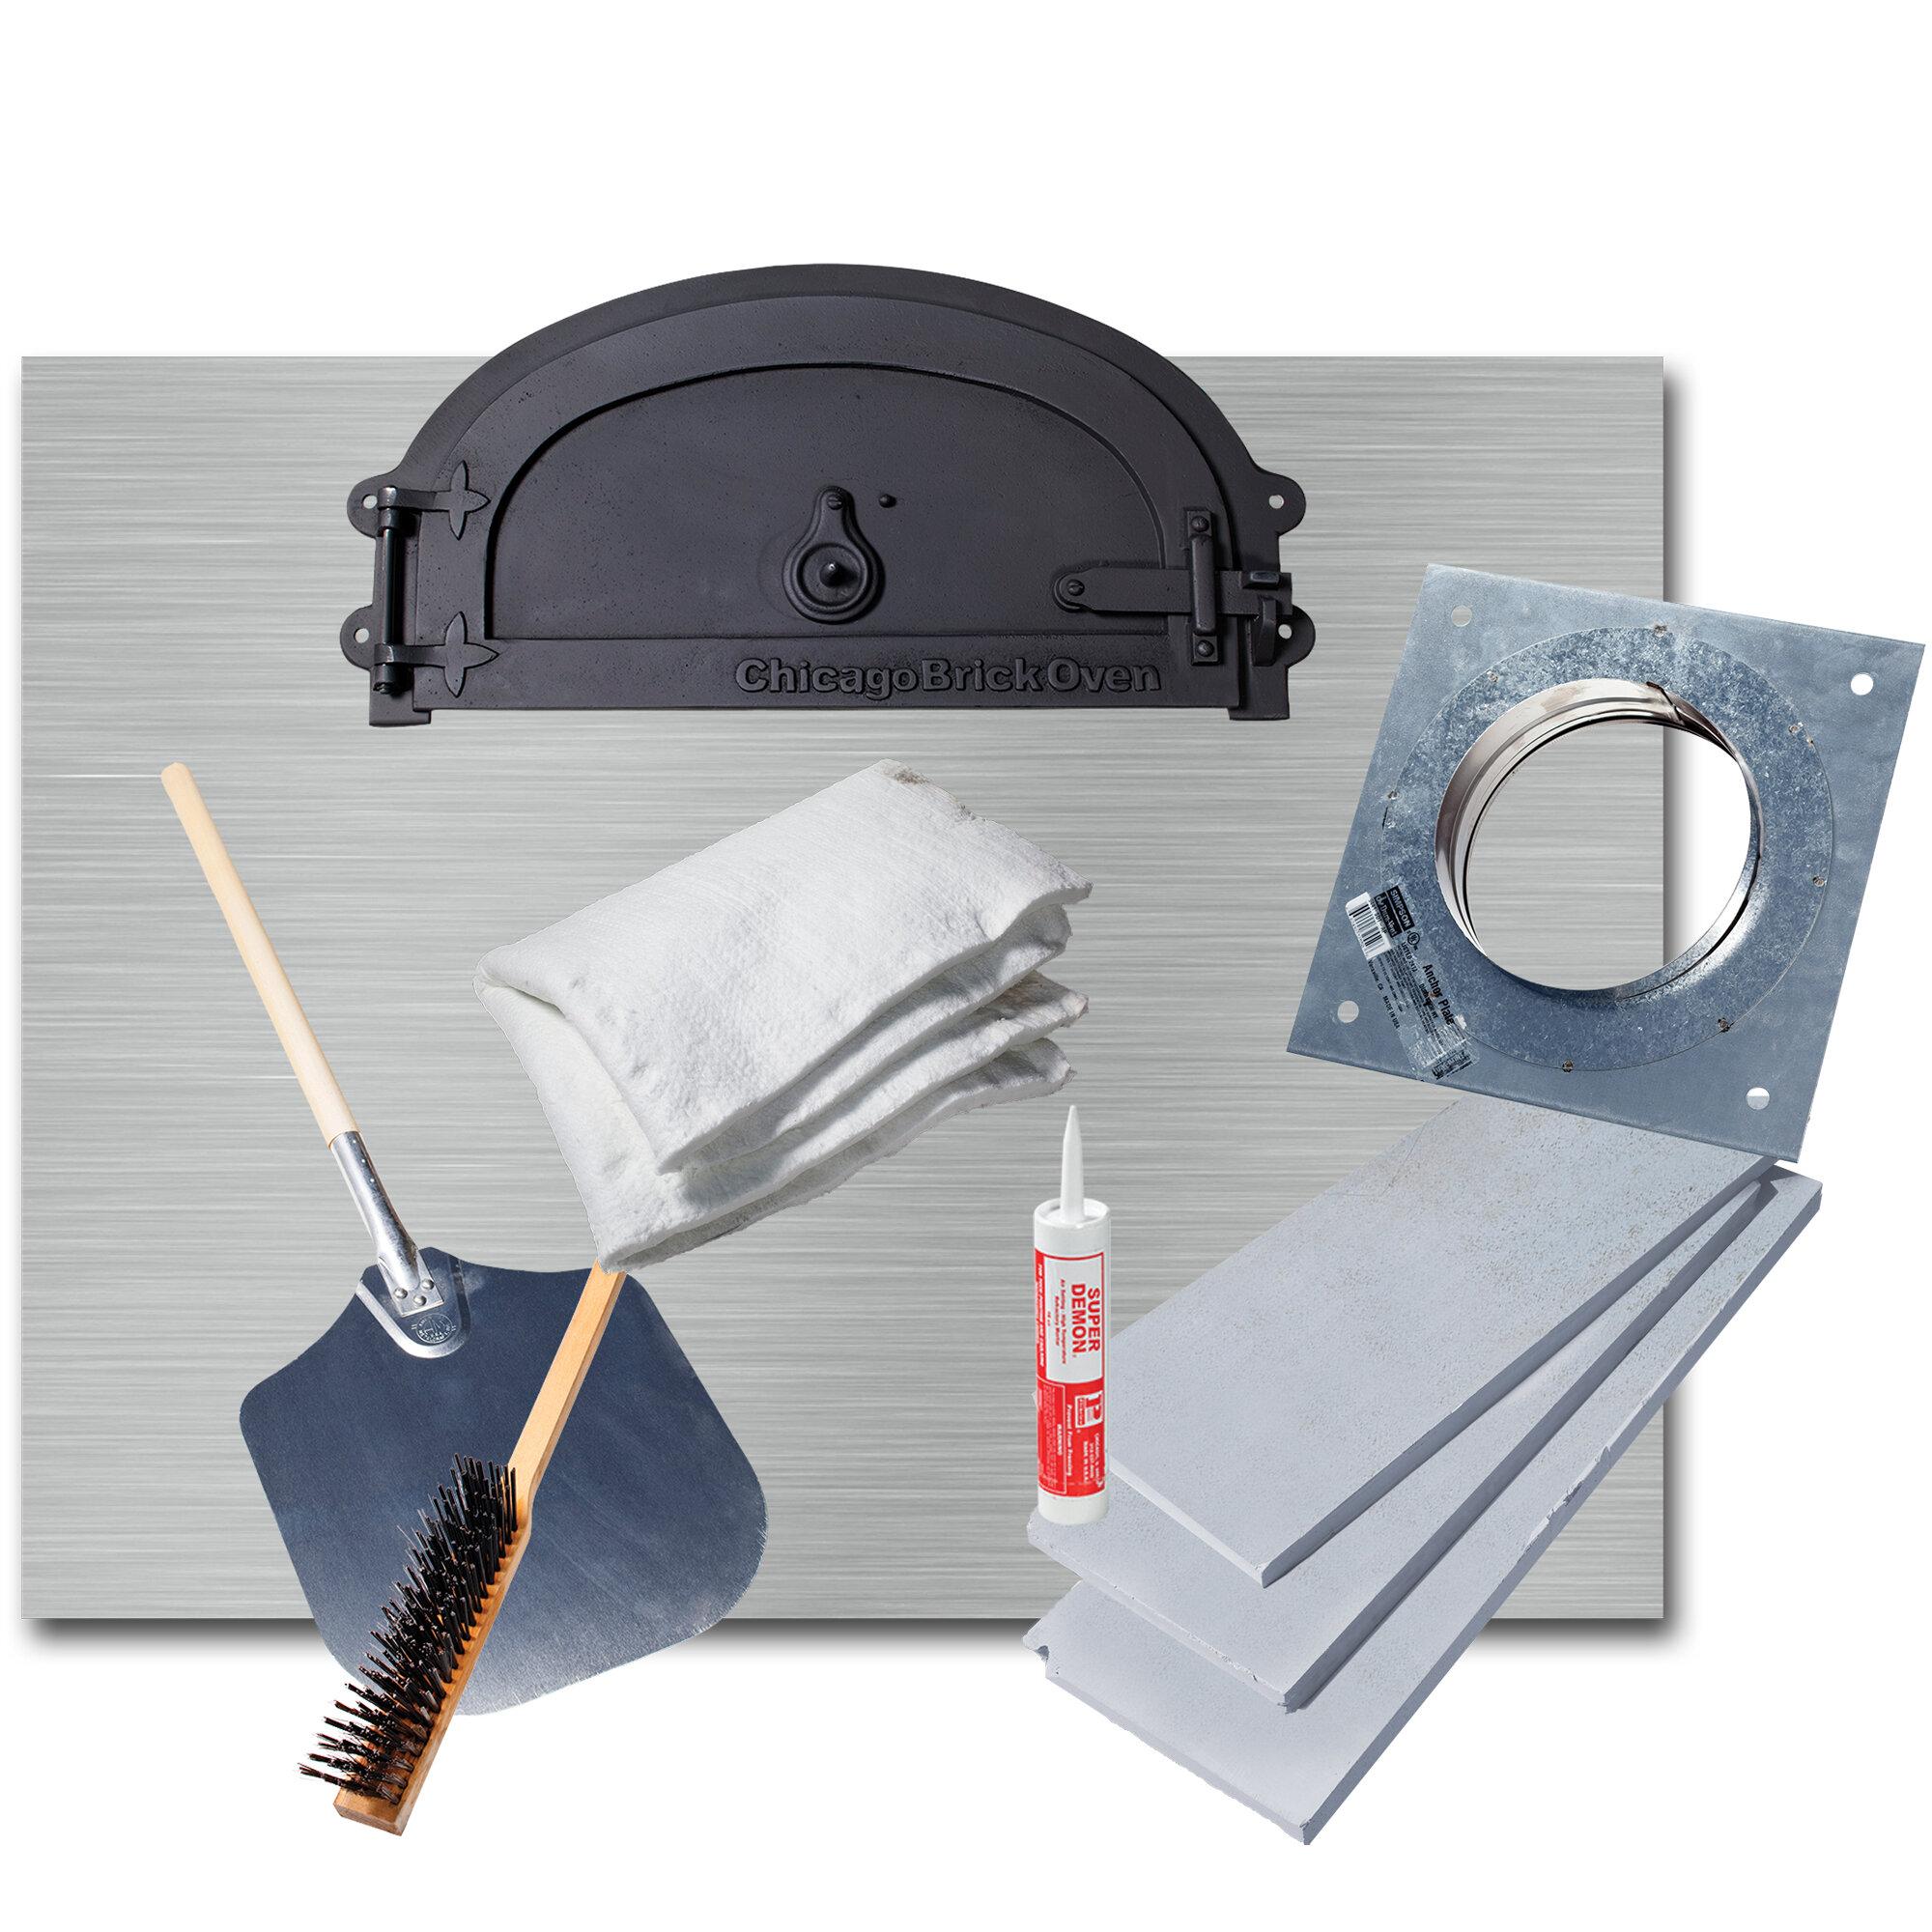 Chicago brick oven wood burning pizza oven kit wayfair solutioingenieria Gallery